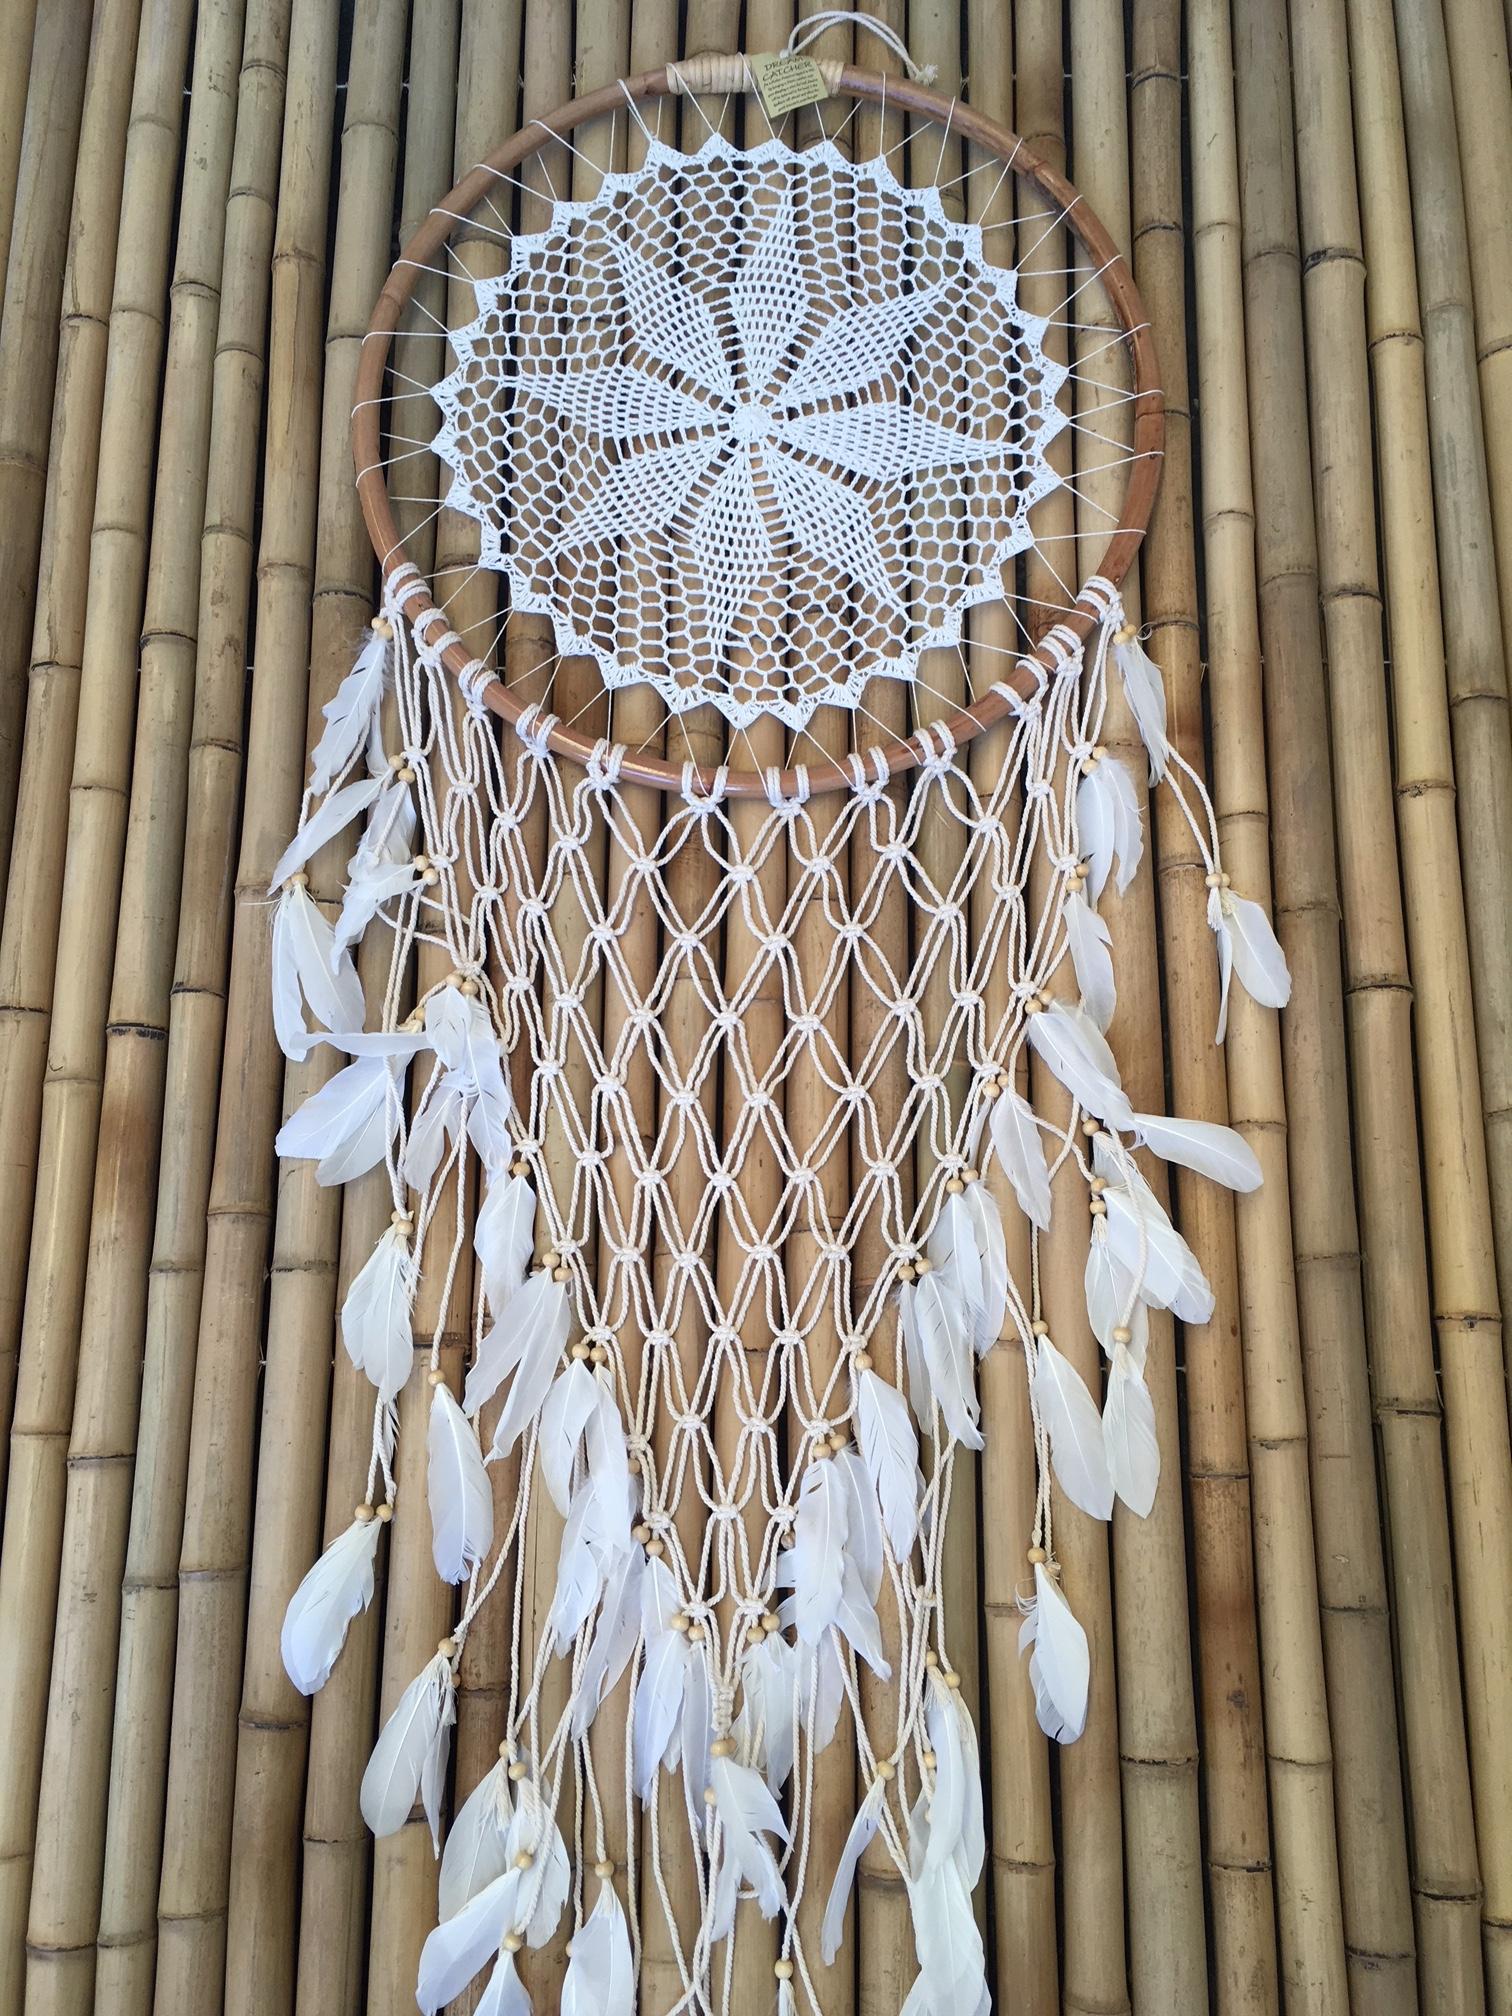 Boho Crochet Dreamcatcher Cane Net Feathers Balikarma Online Shop